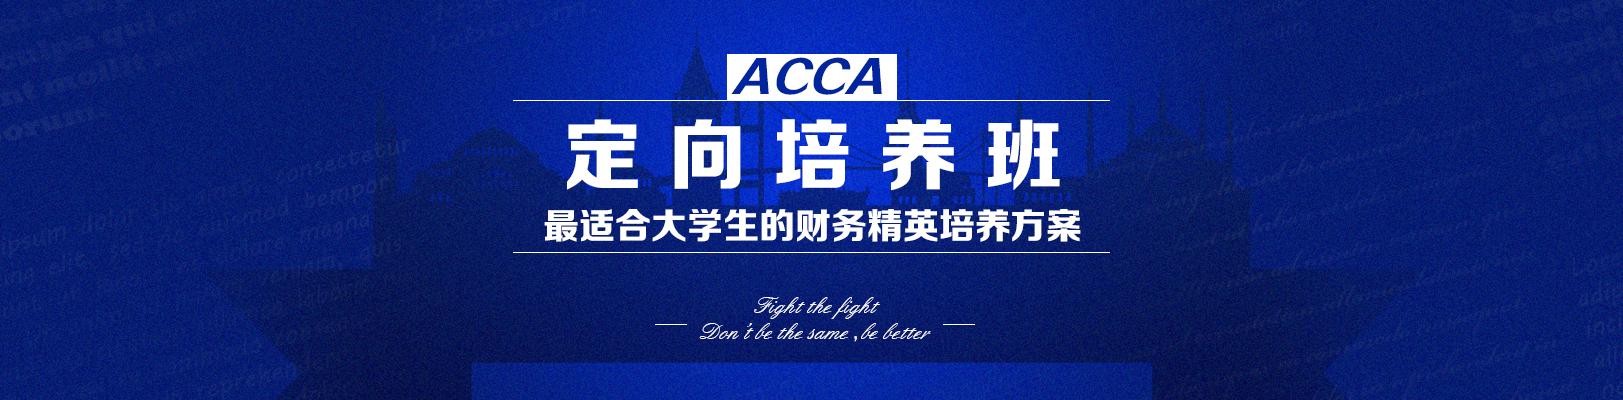 大学生ACCA定向培养班